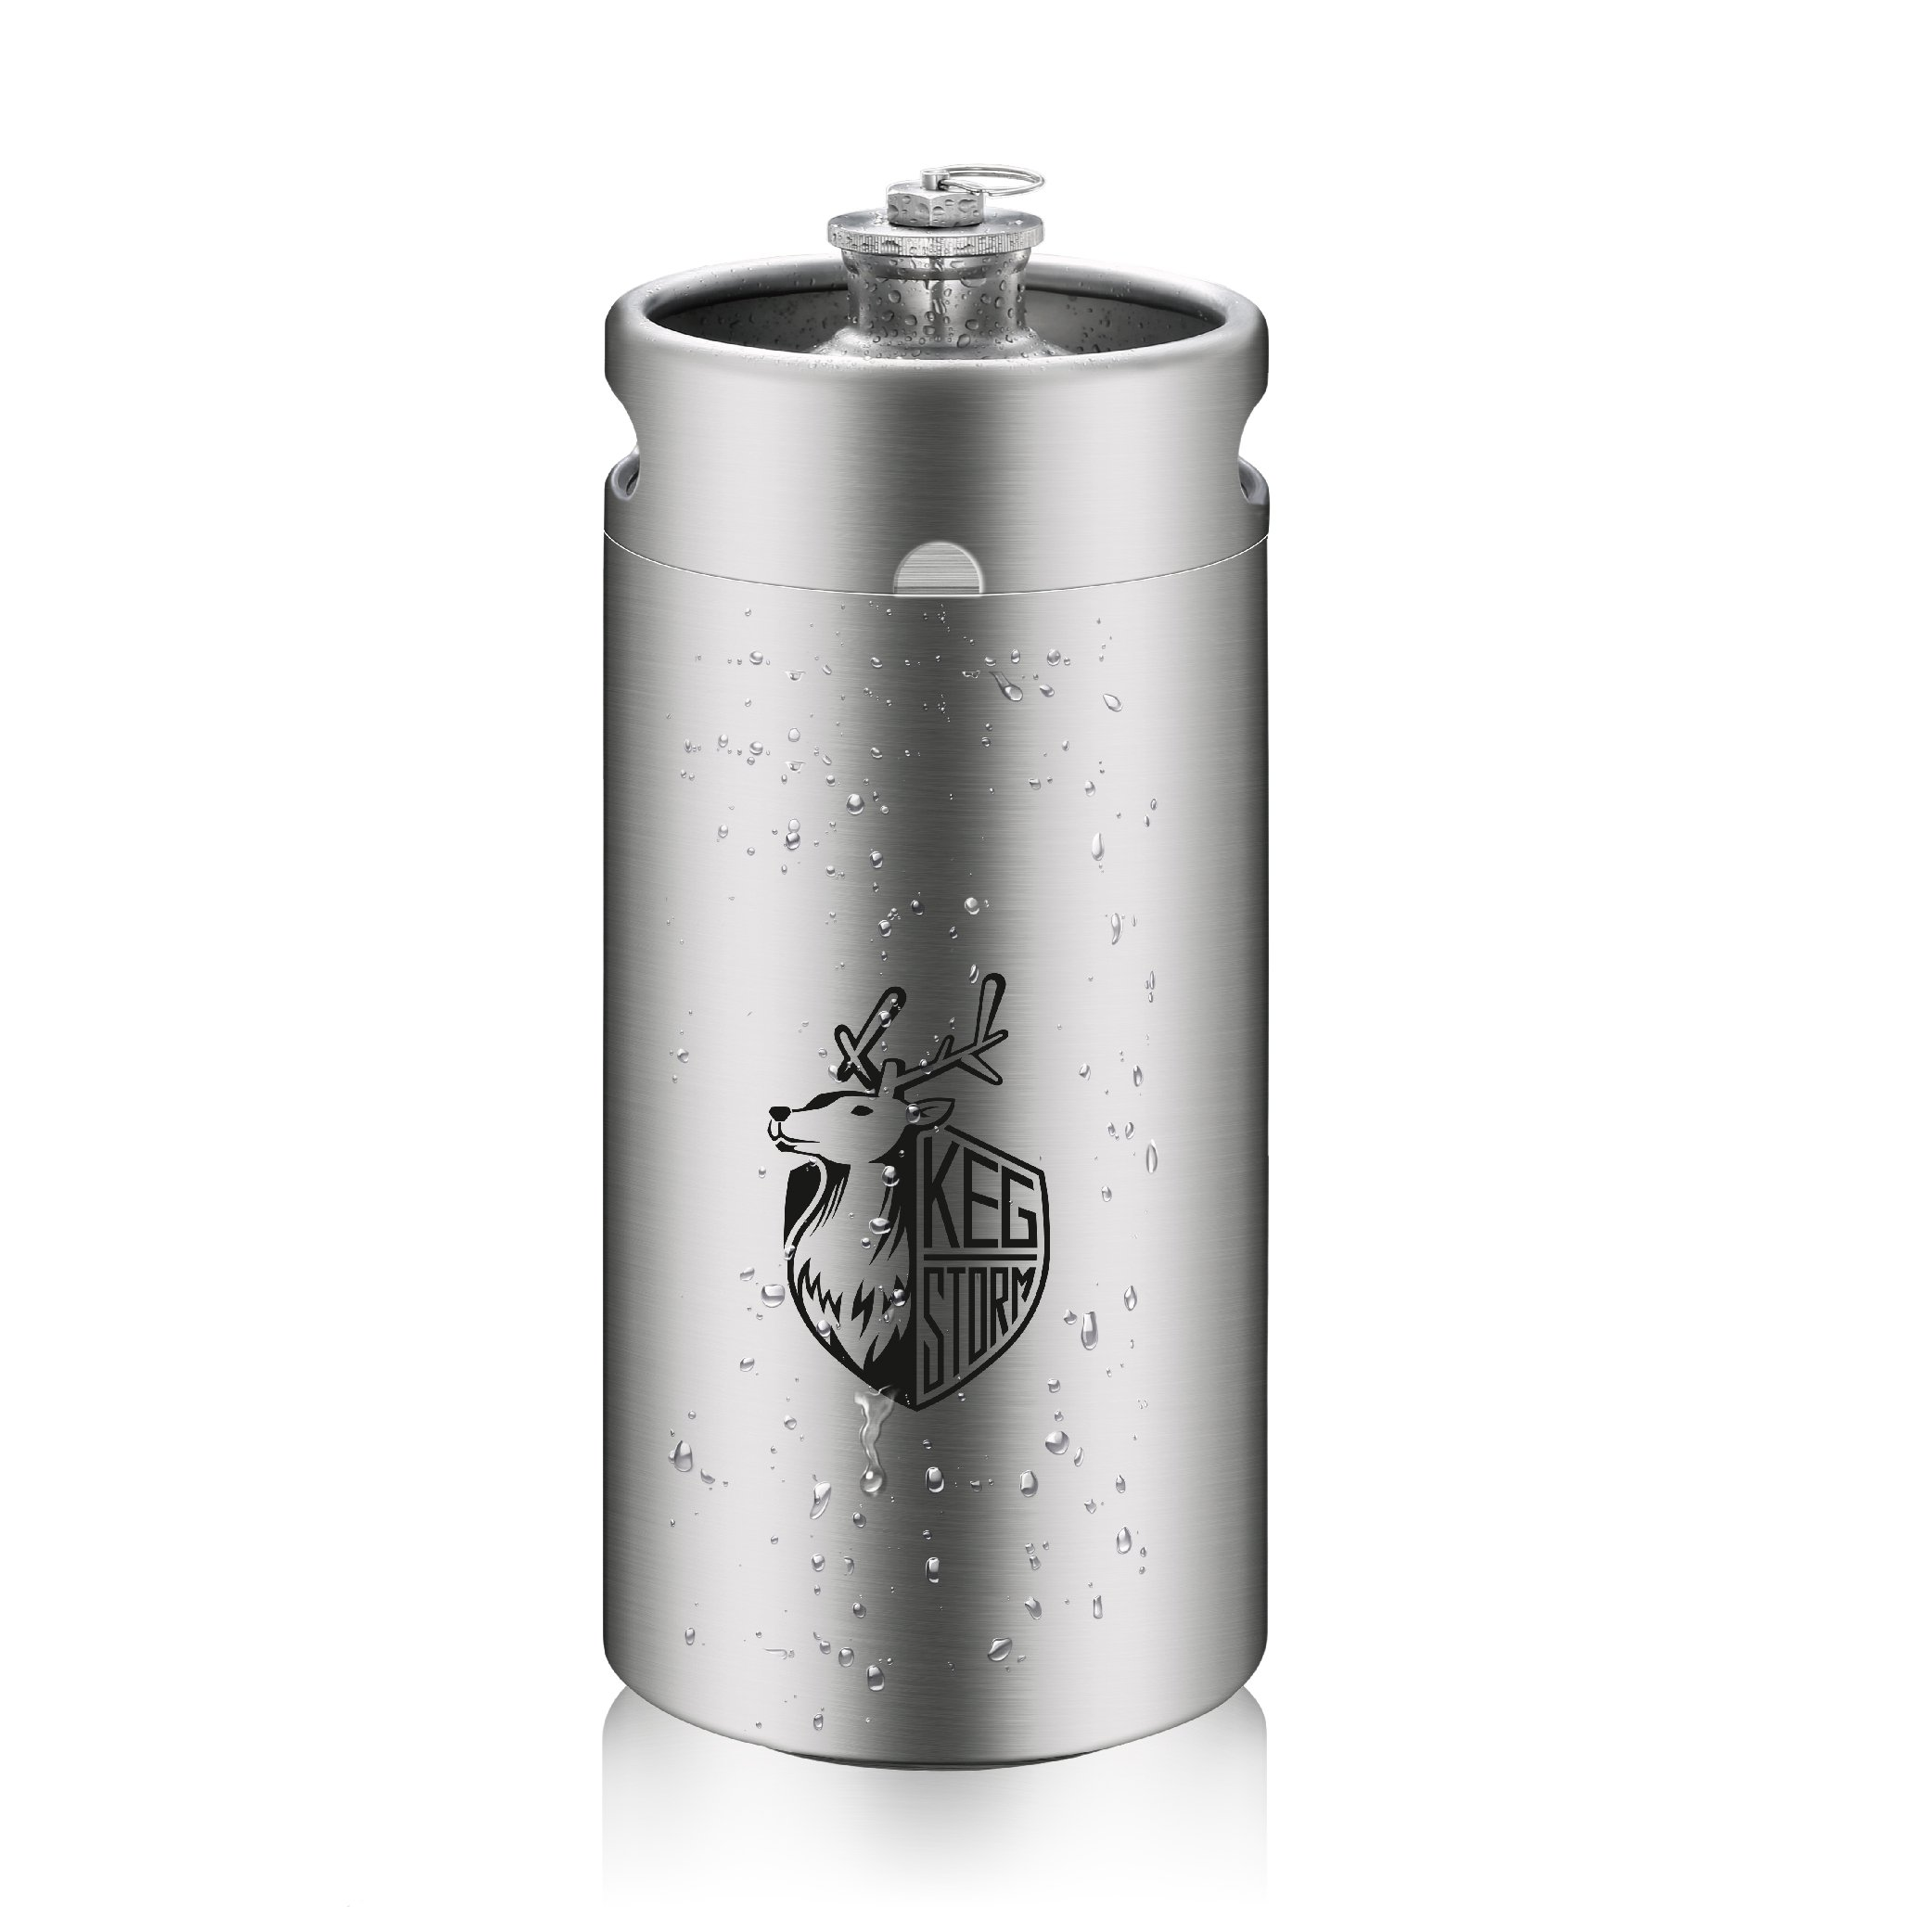 KEG STORM 128oz Mini Keg Style Growler Food Grade 18/8 Stainless Steel Barrel for Beer Brewing